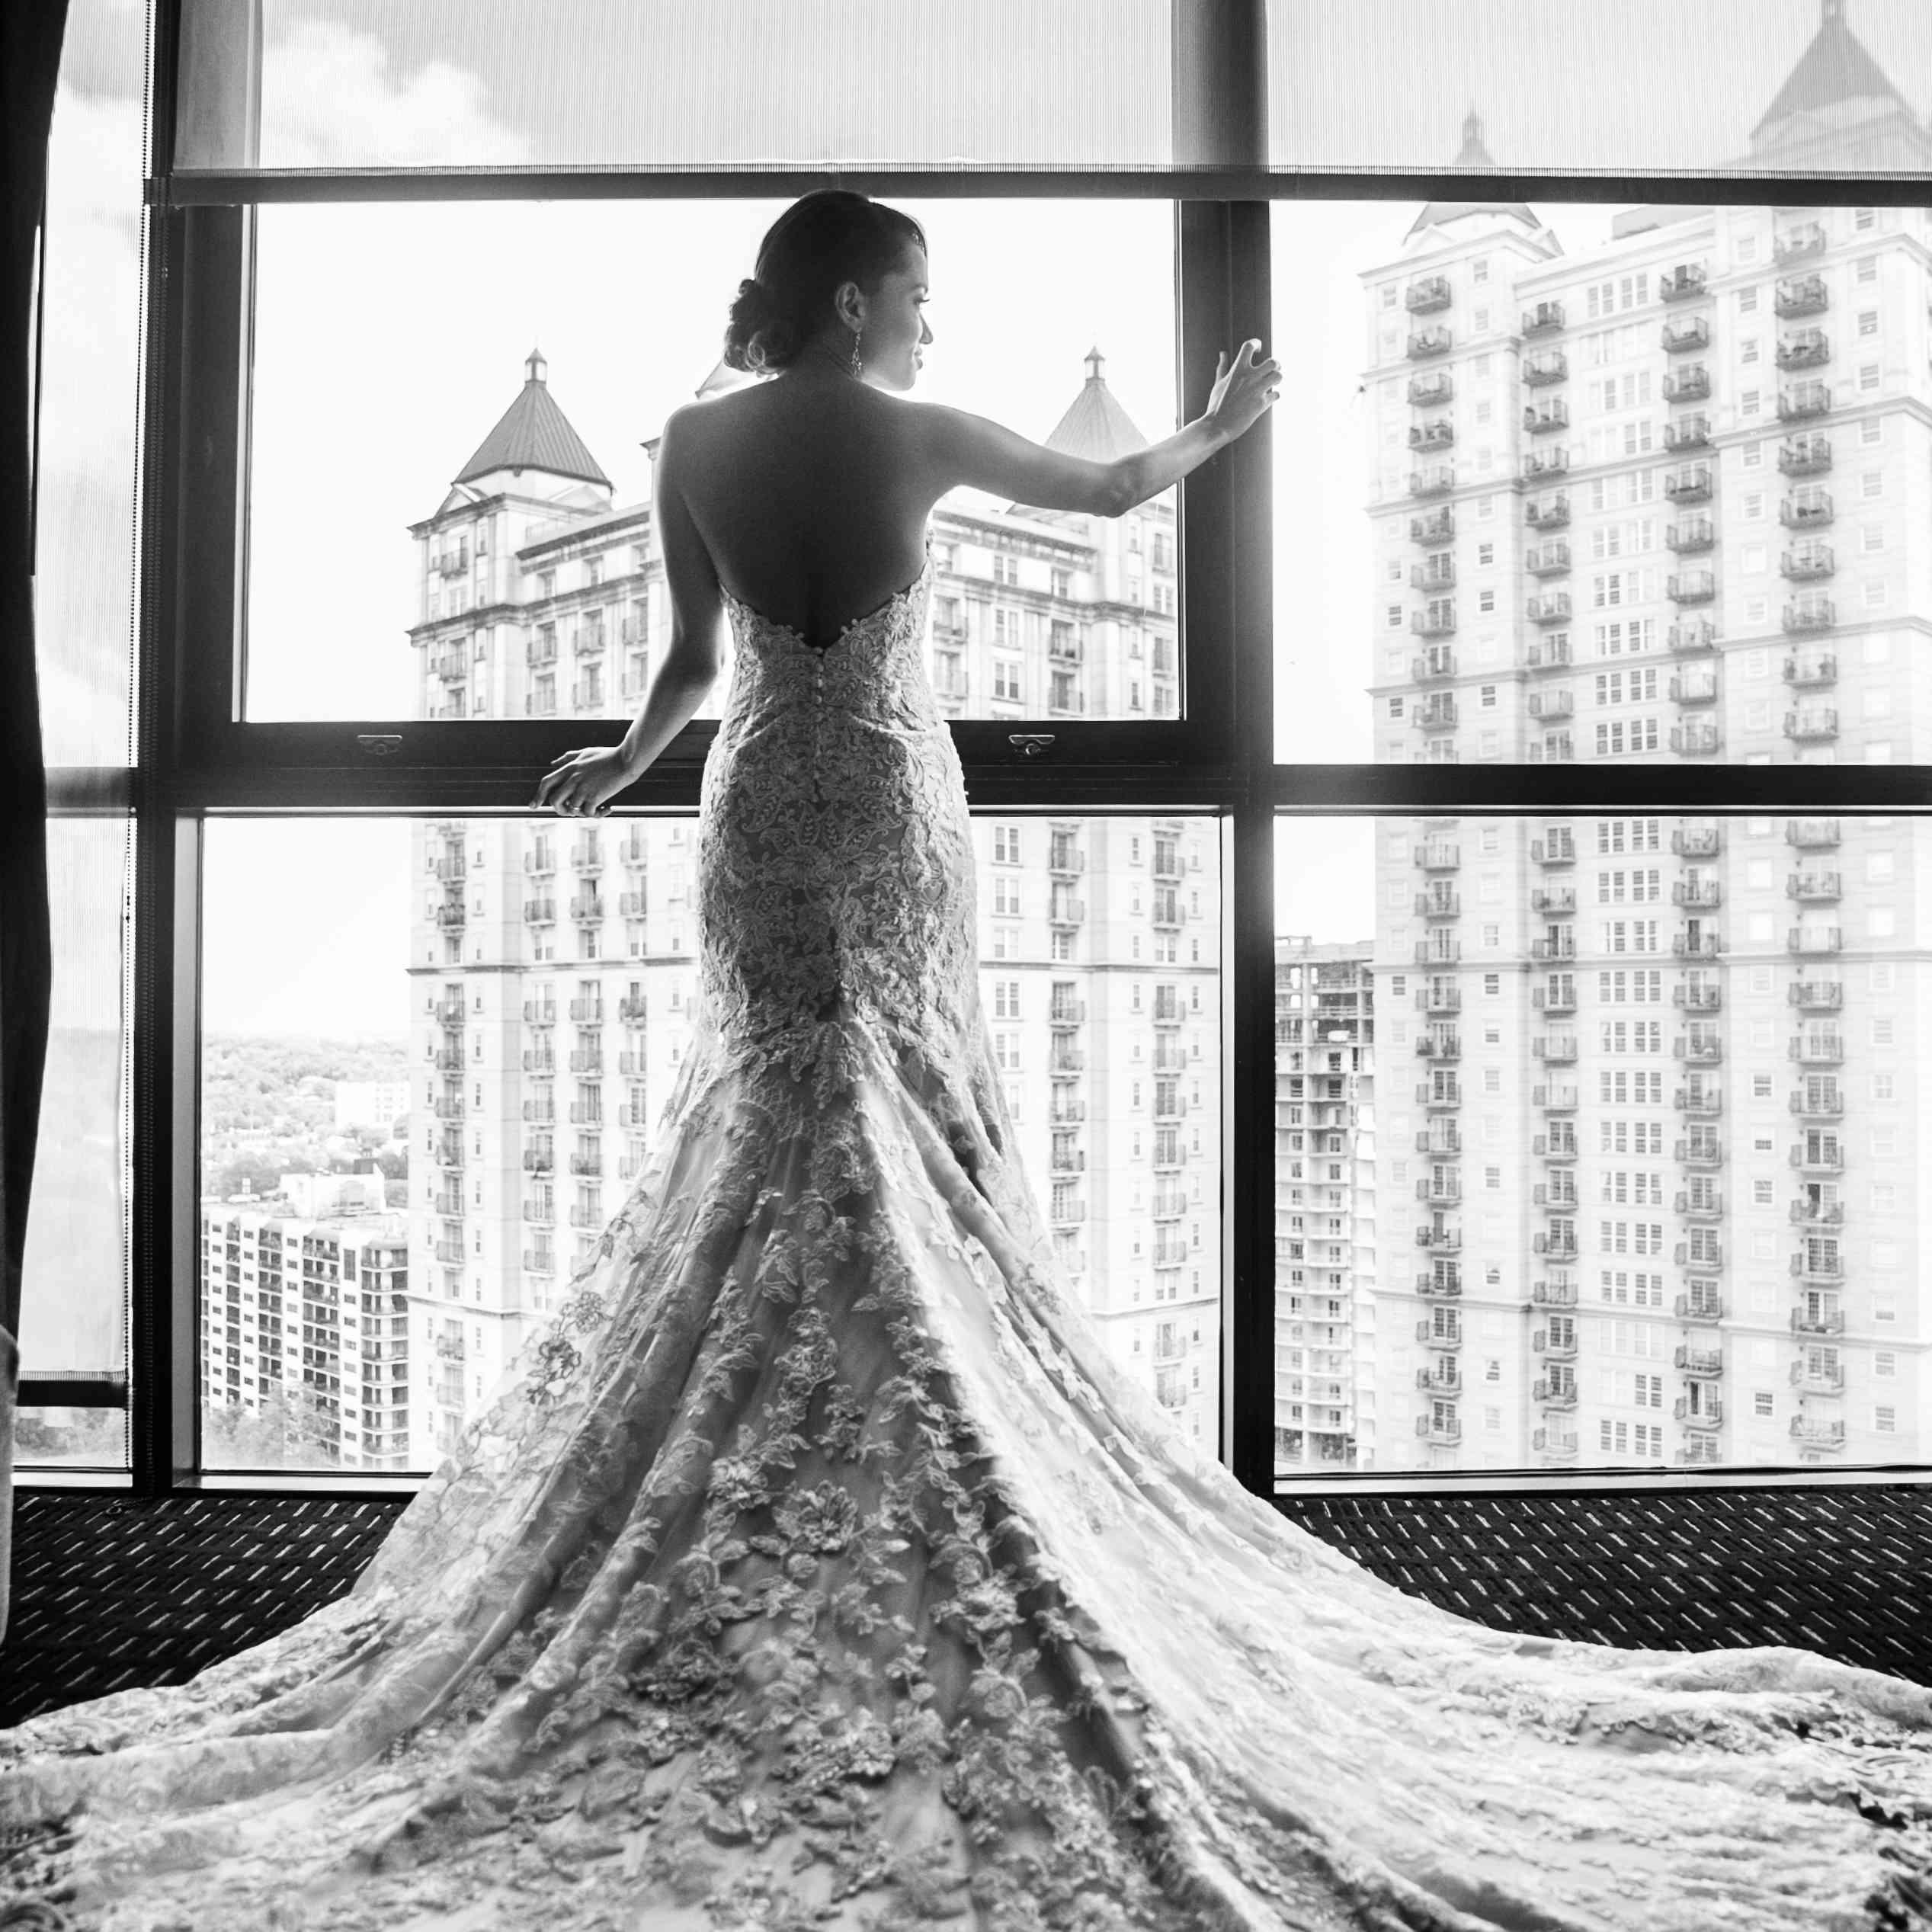 <p>Bridal Portrait at Hotel</p><br><br>